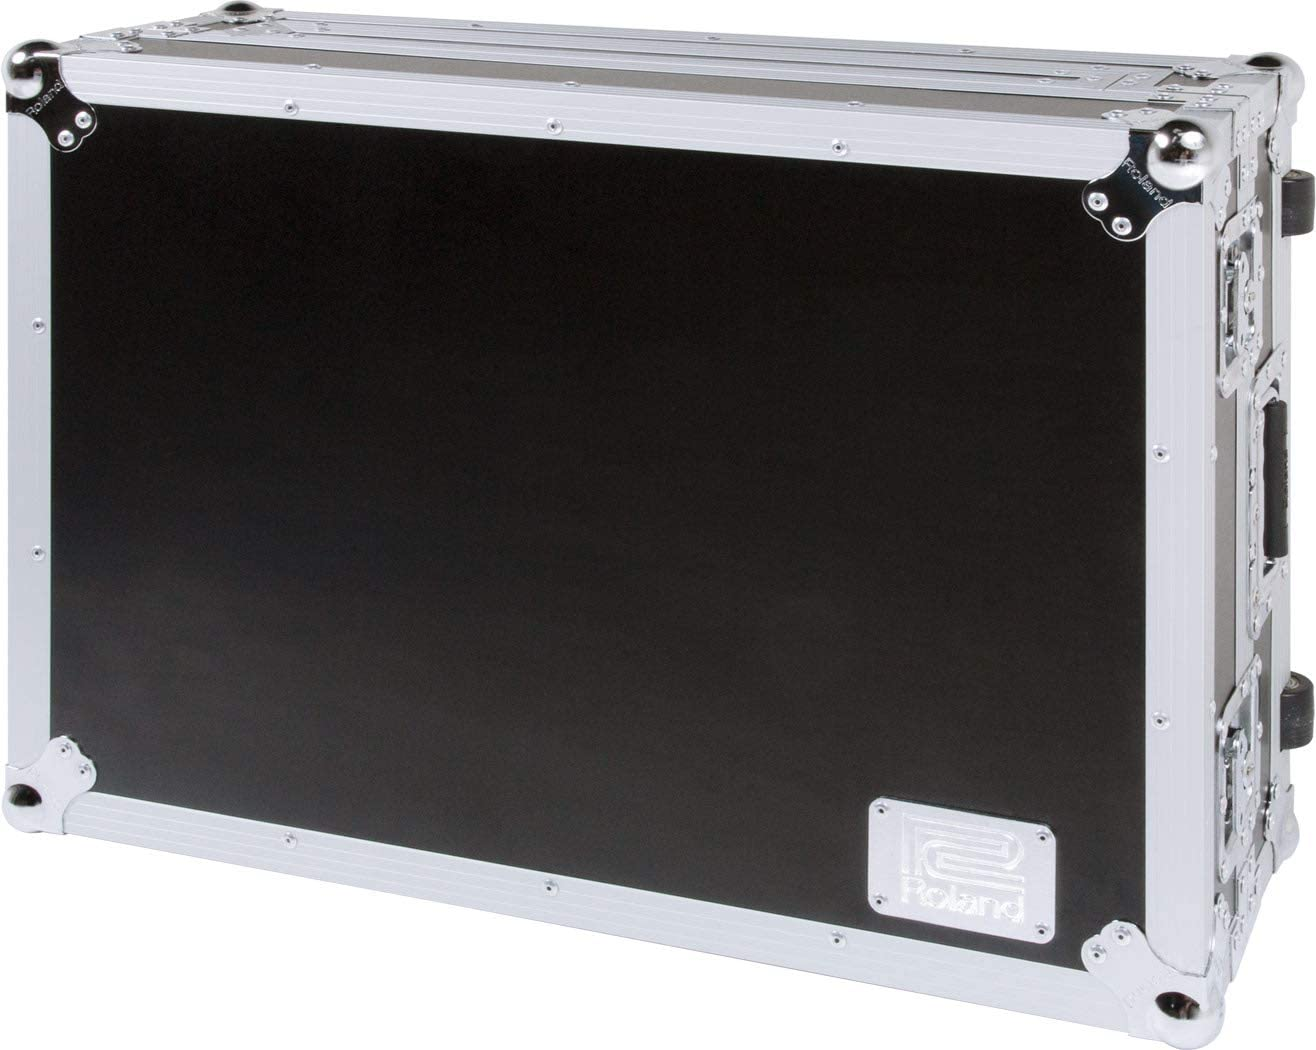 Roland RRC-DJ808W Heavy Duty Road Case for the Roland DJ-808 DJ Controller